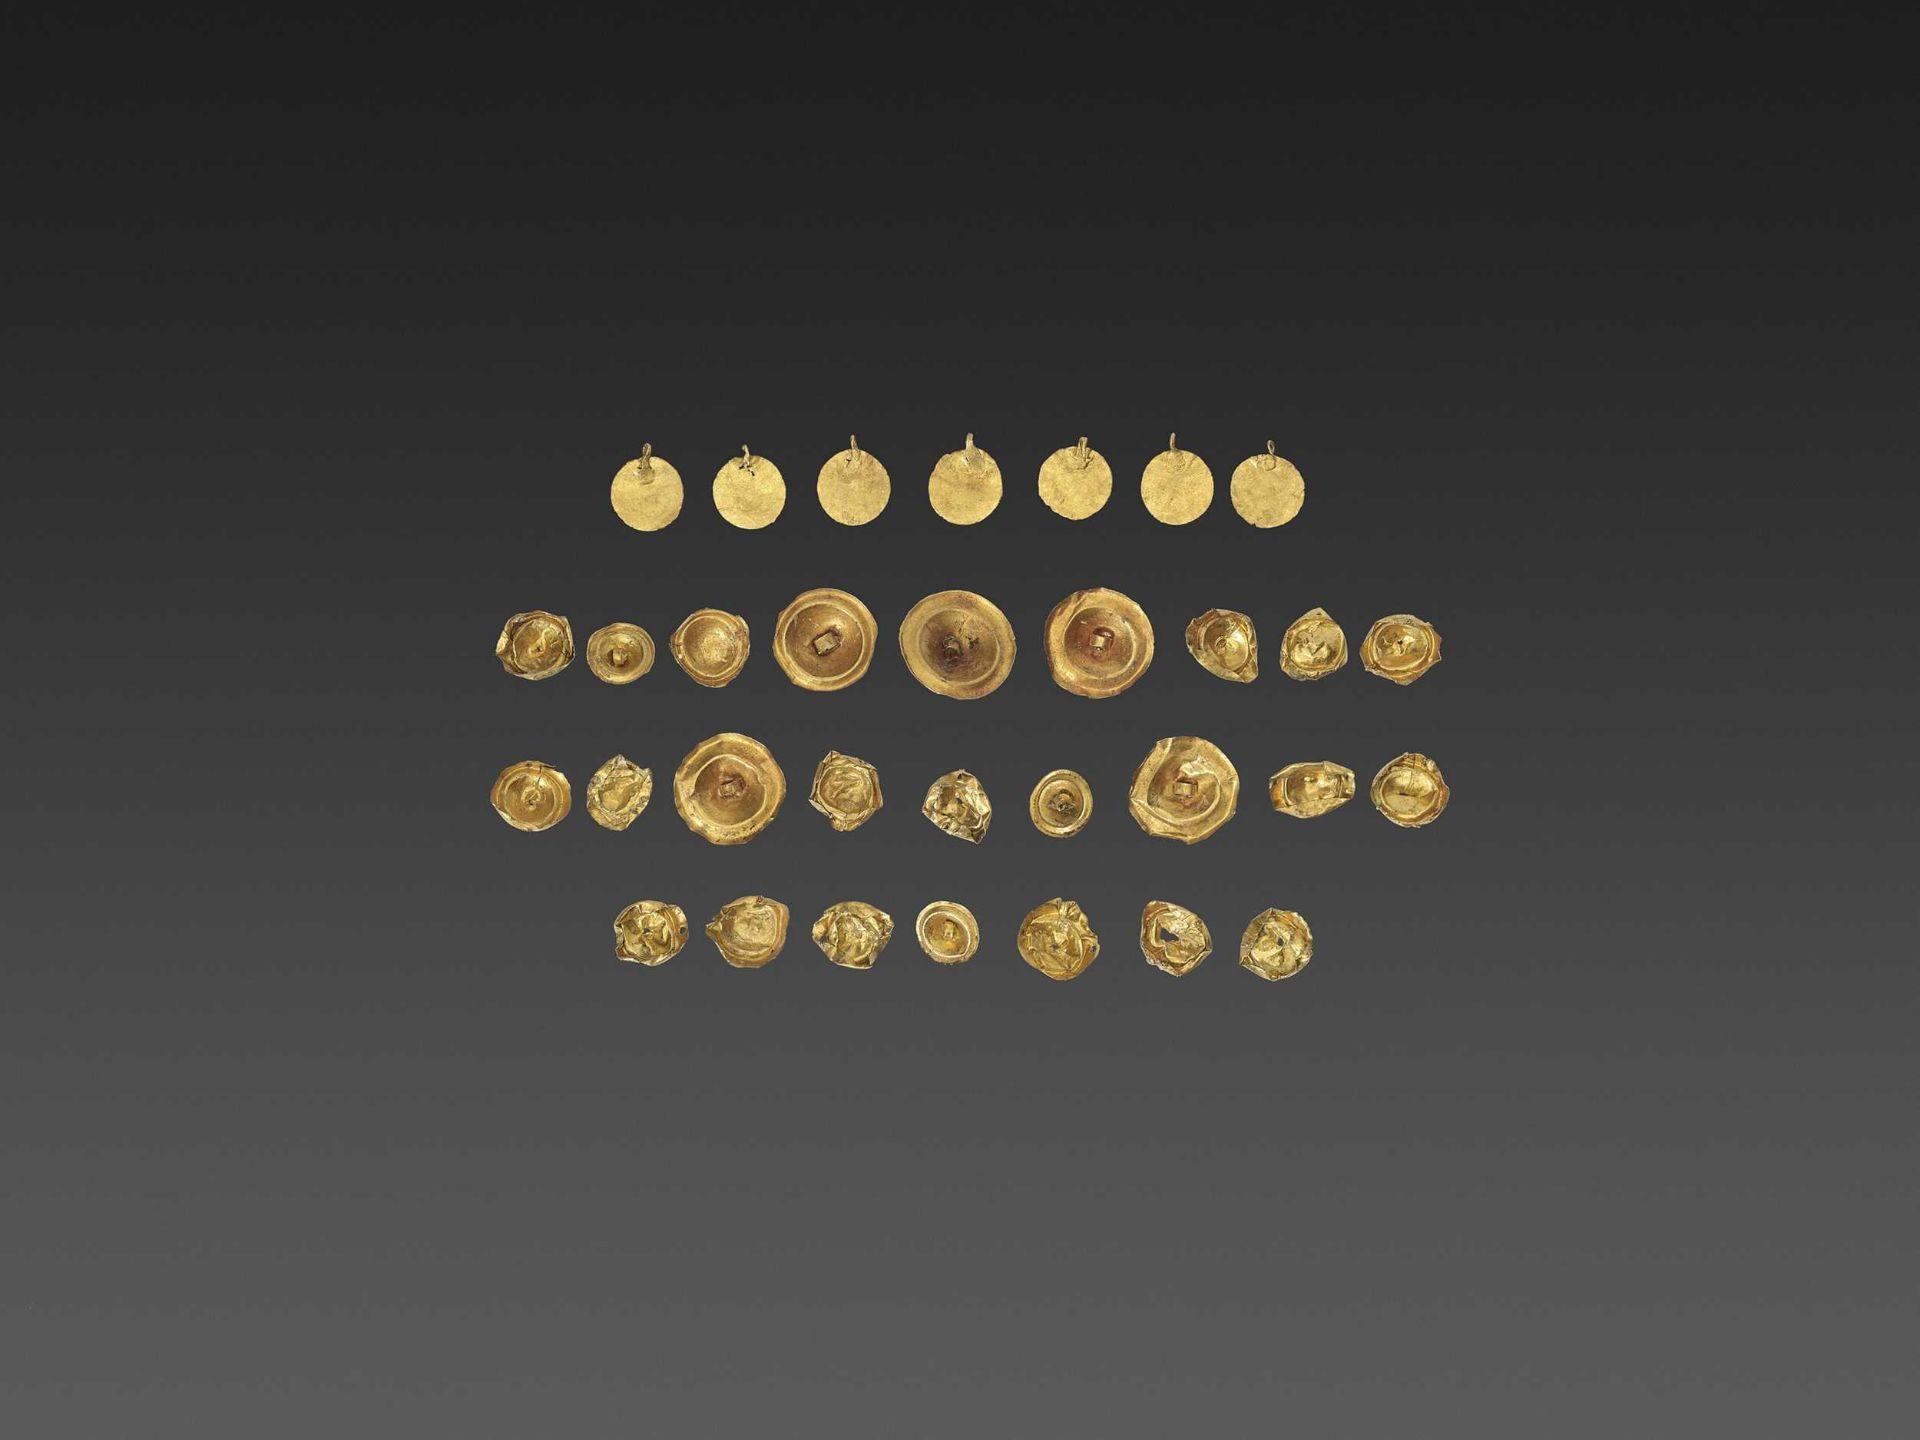 32 BACTRIAN GOLD GARM ENT ORNAMENTS - Bild 4 aus 4